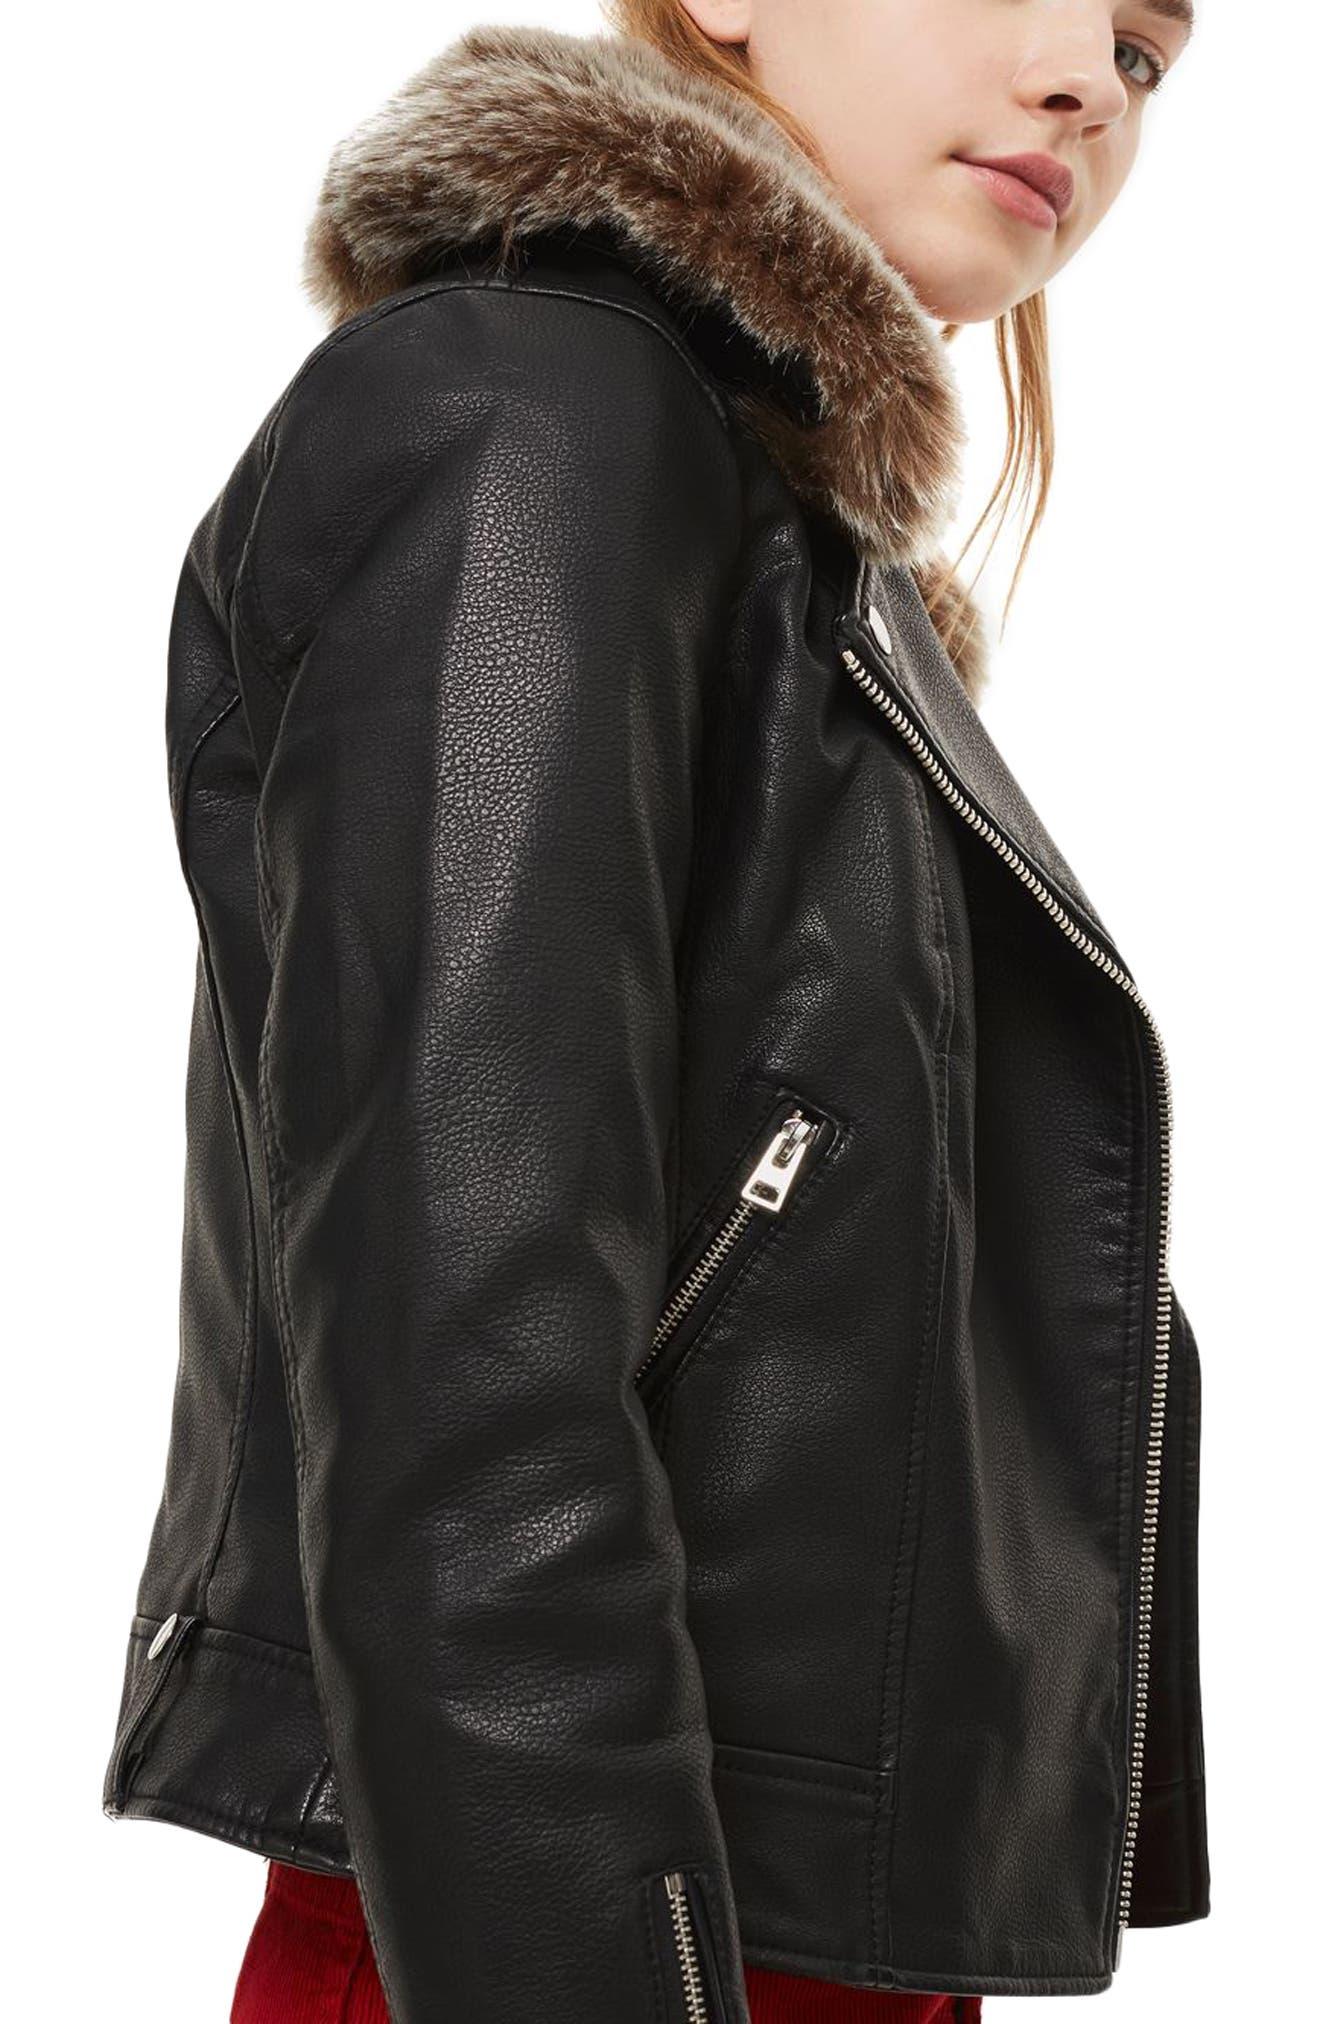 Rayne Faux Fur Trim Biker Jacket,                             Alternate thumbnail 3, color,                             001